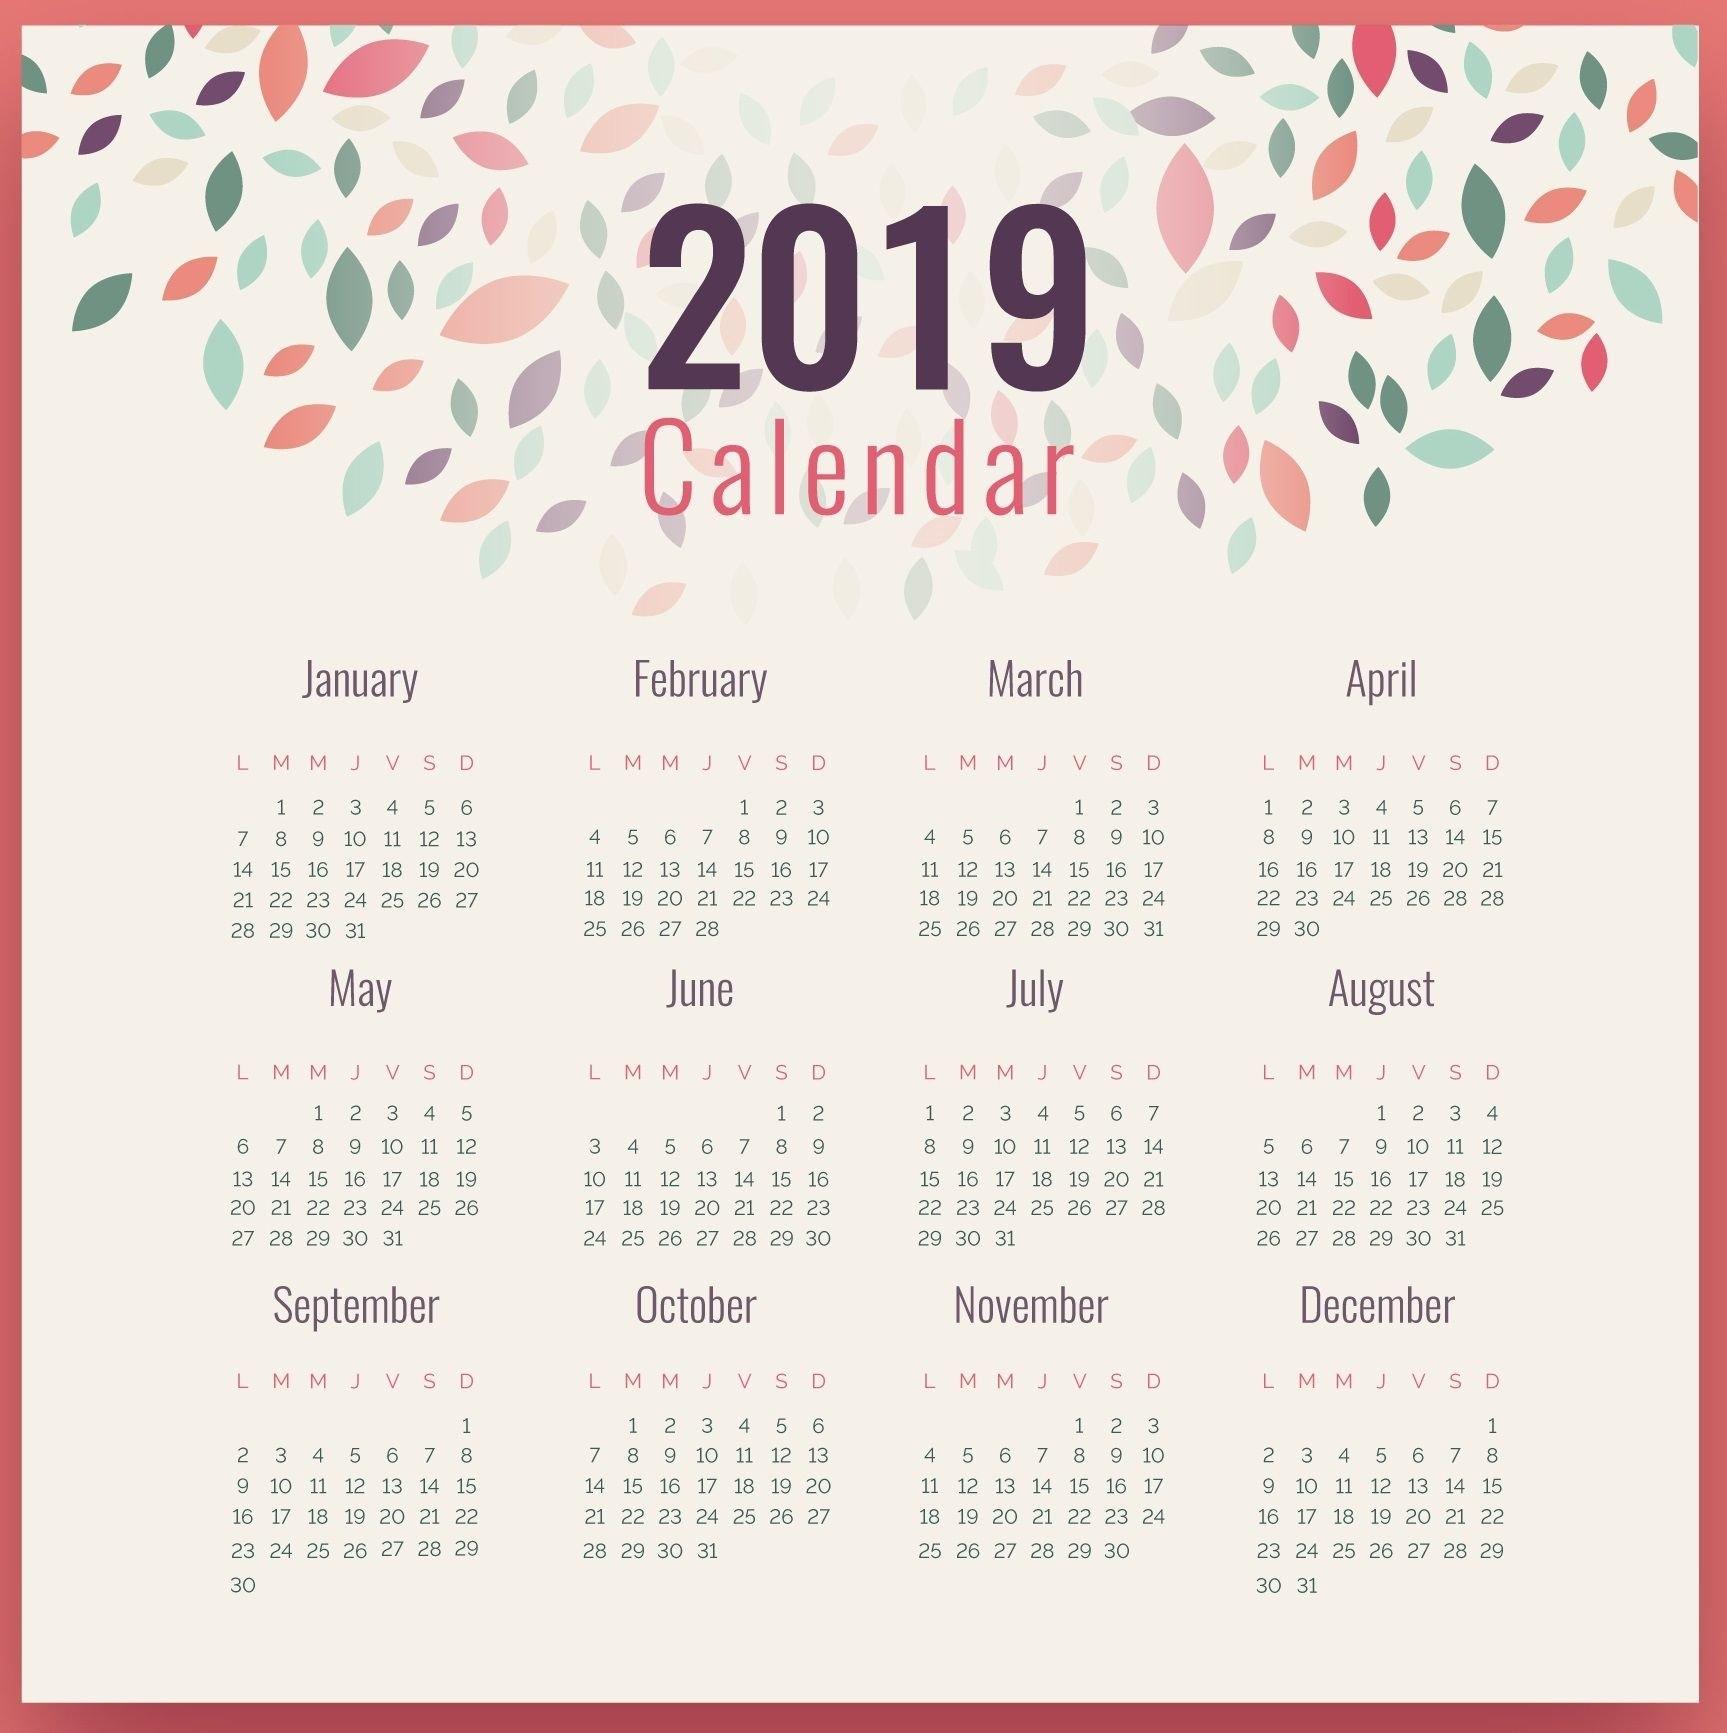 2019 Calendar Photo Frame Design | Calendar 2019 | Kalender J 2019 Calendar